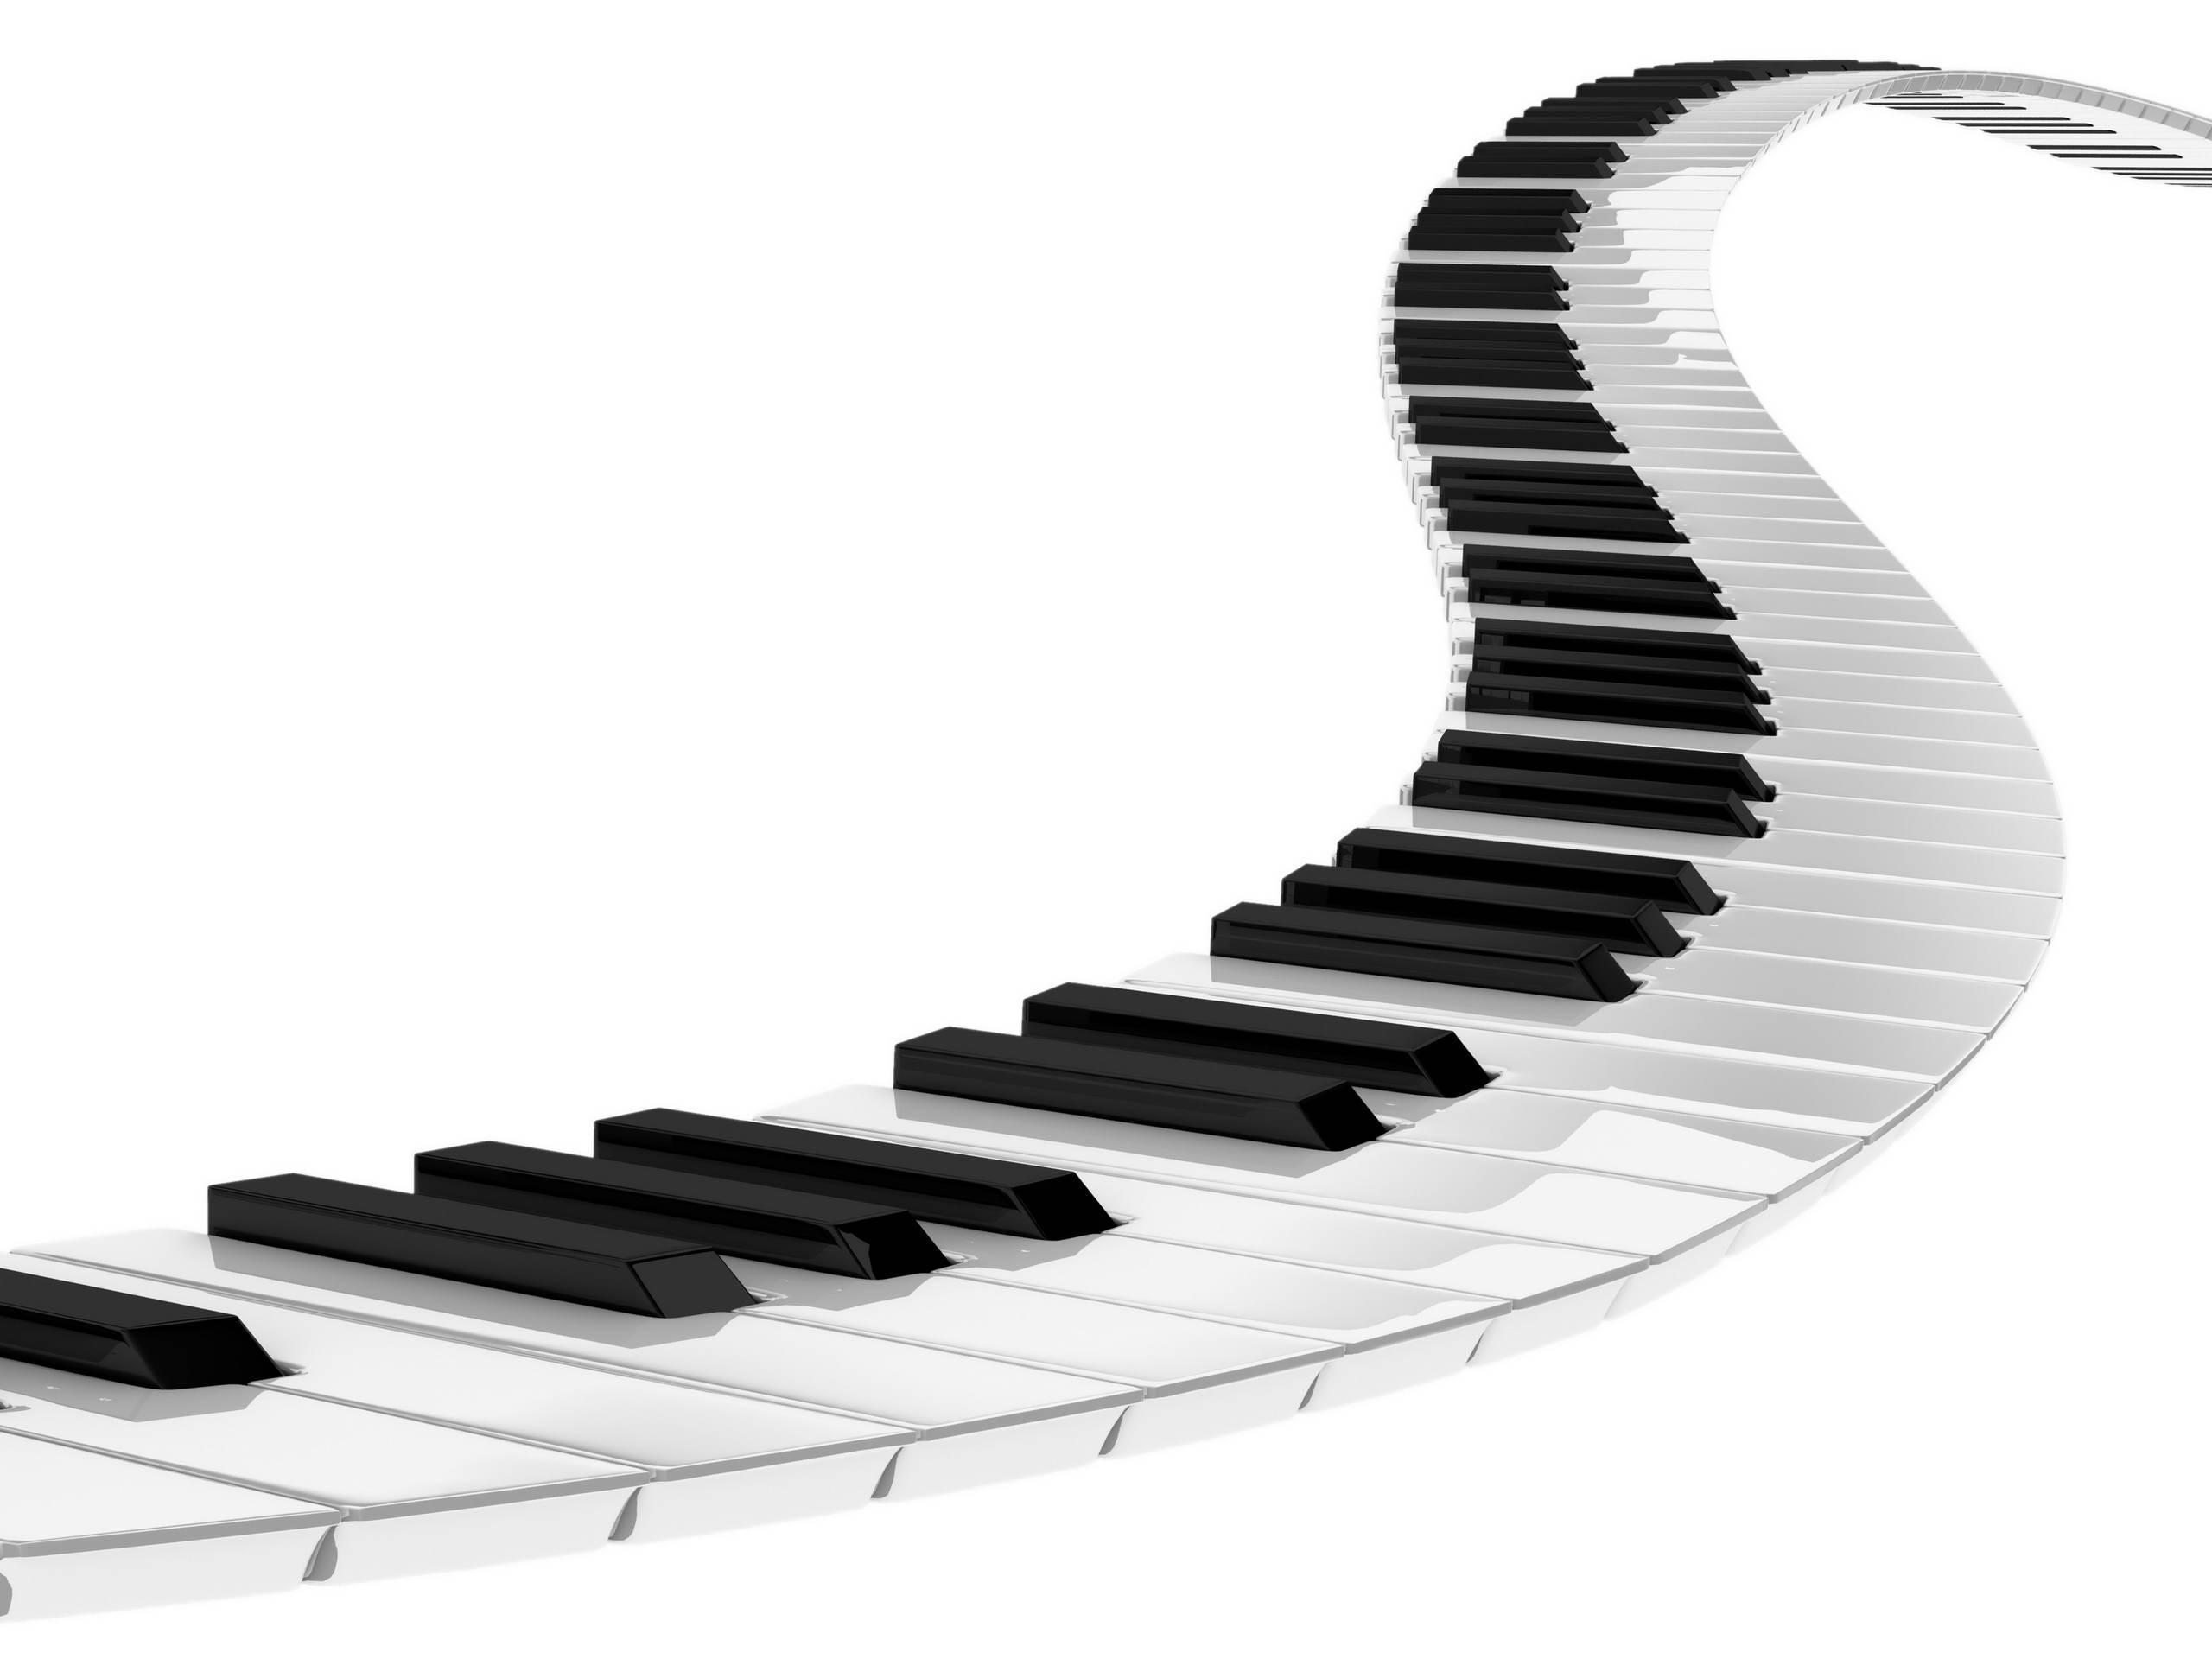 piano keys wallpapers wallpaper cave. Black Bedroom Furniture Sets. Home Design Ideas